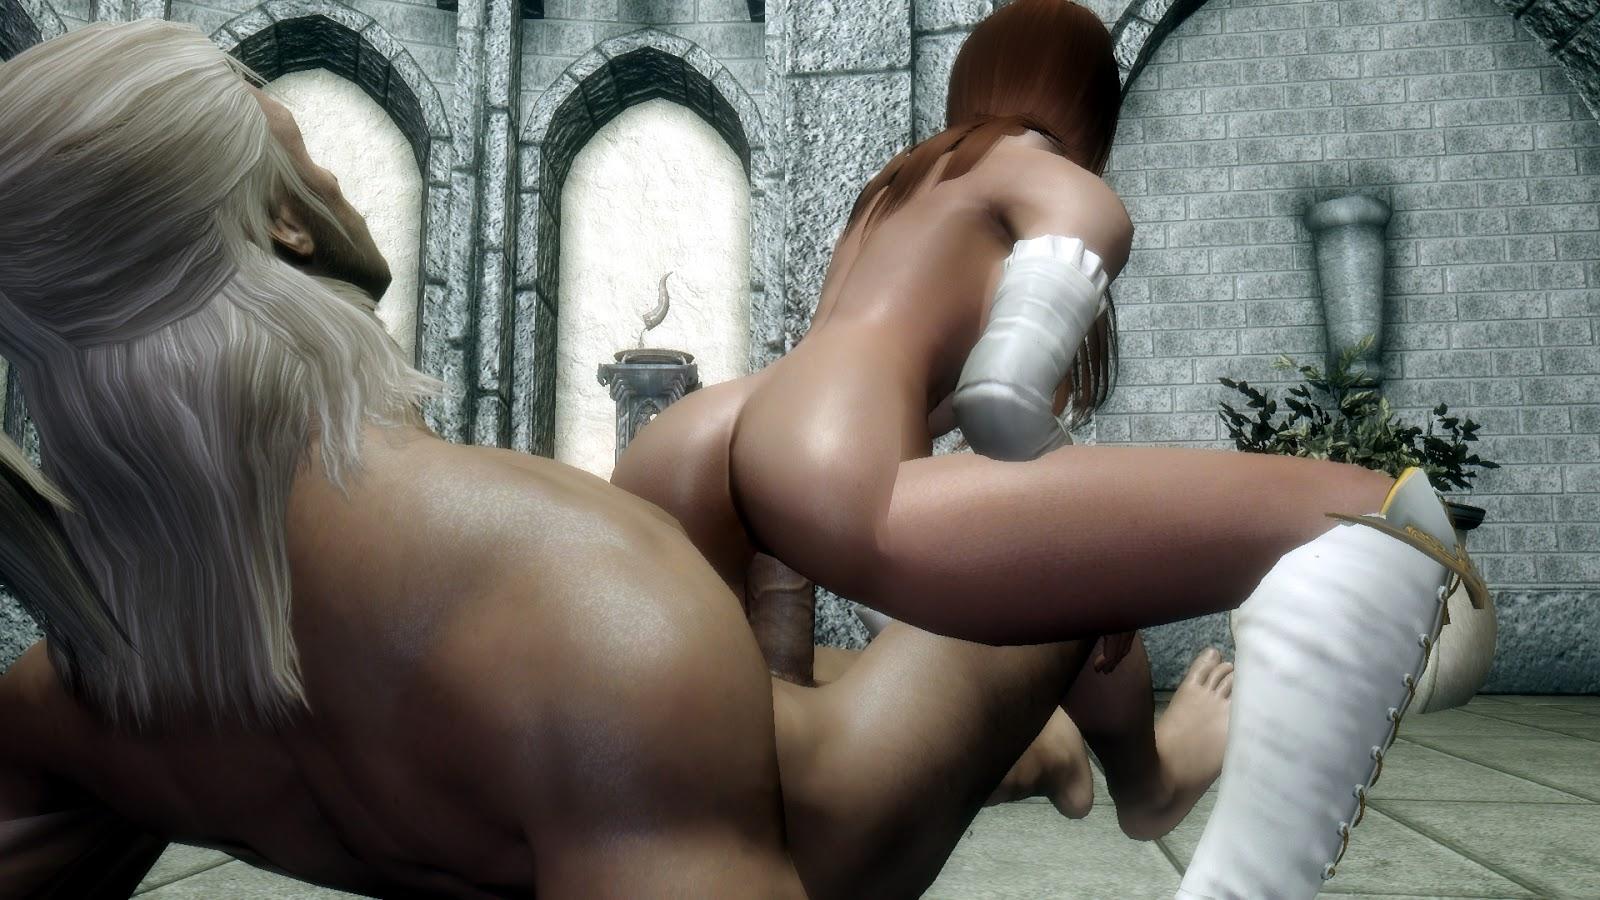 Nudes - favoredsoulmeshes - erectversion